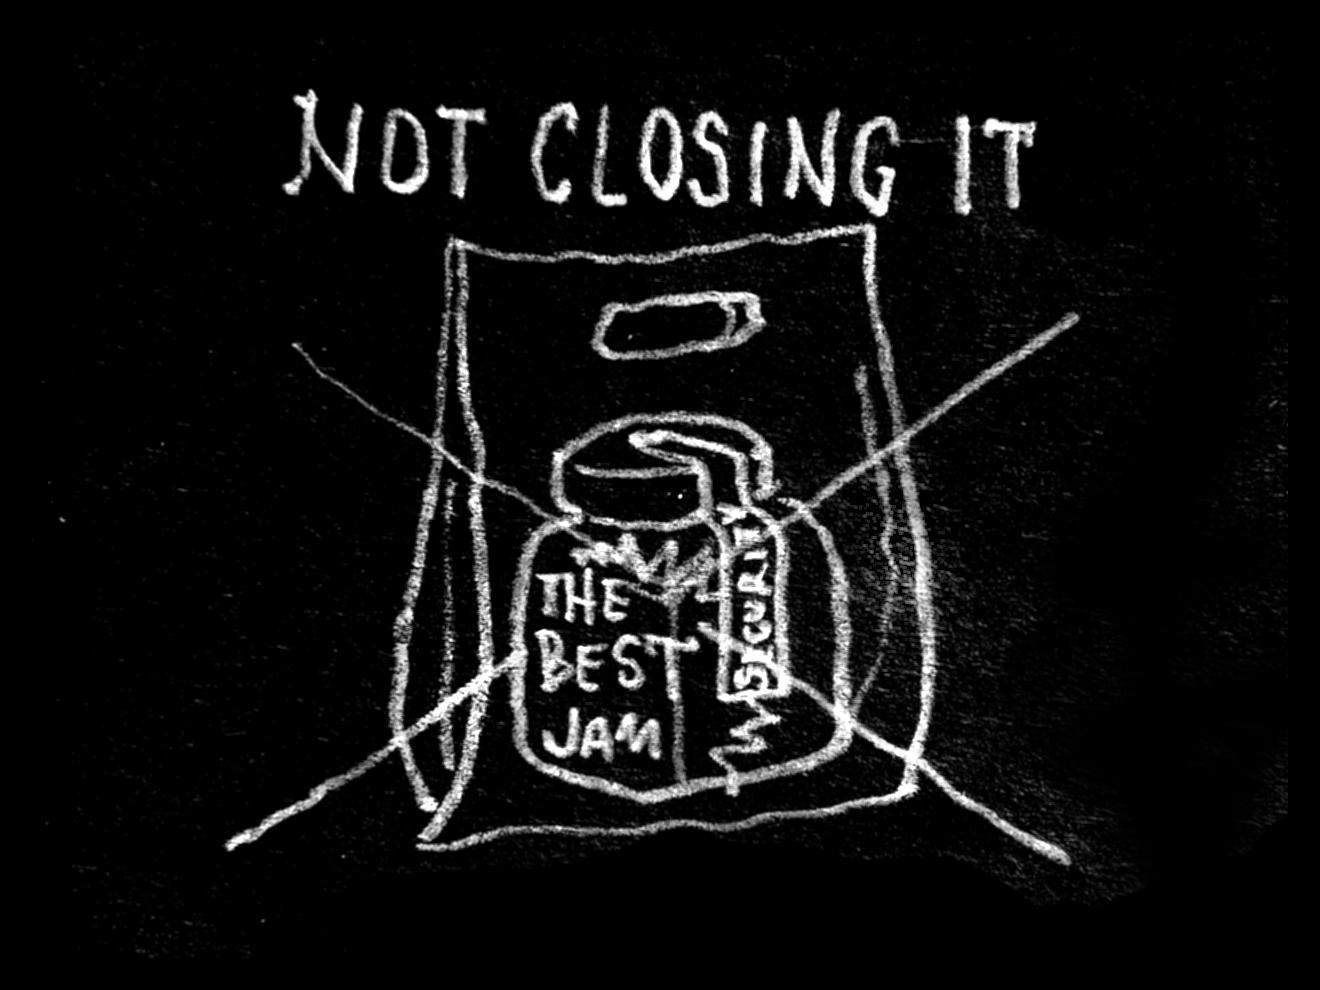 Do not enclose it